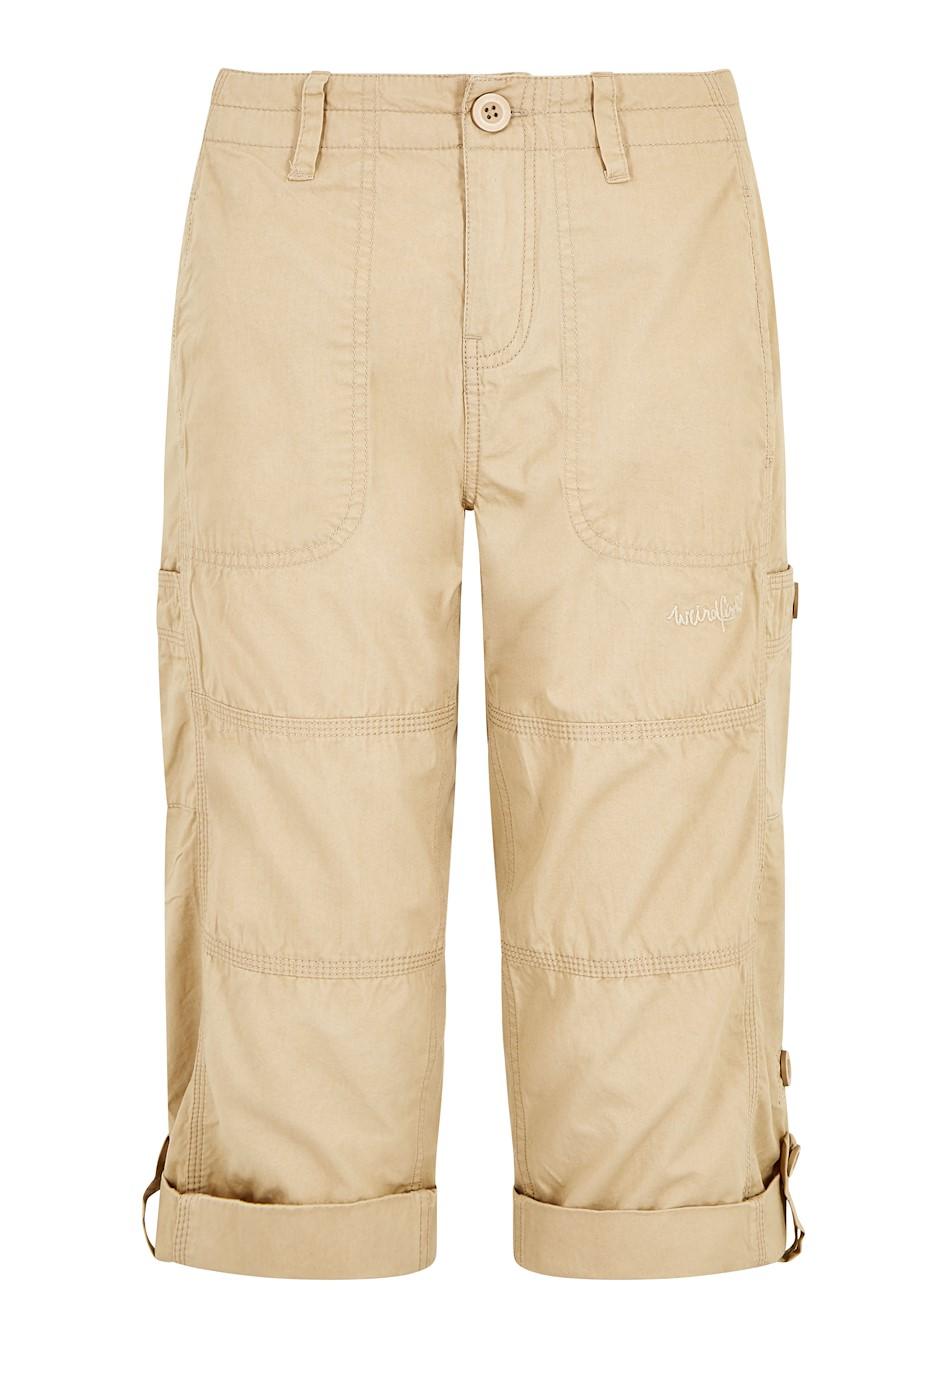 Salena Organic Cotton 3/4 Length Trousers Khaki